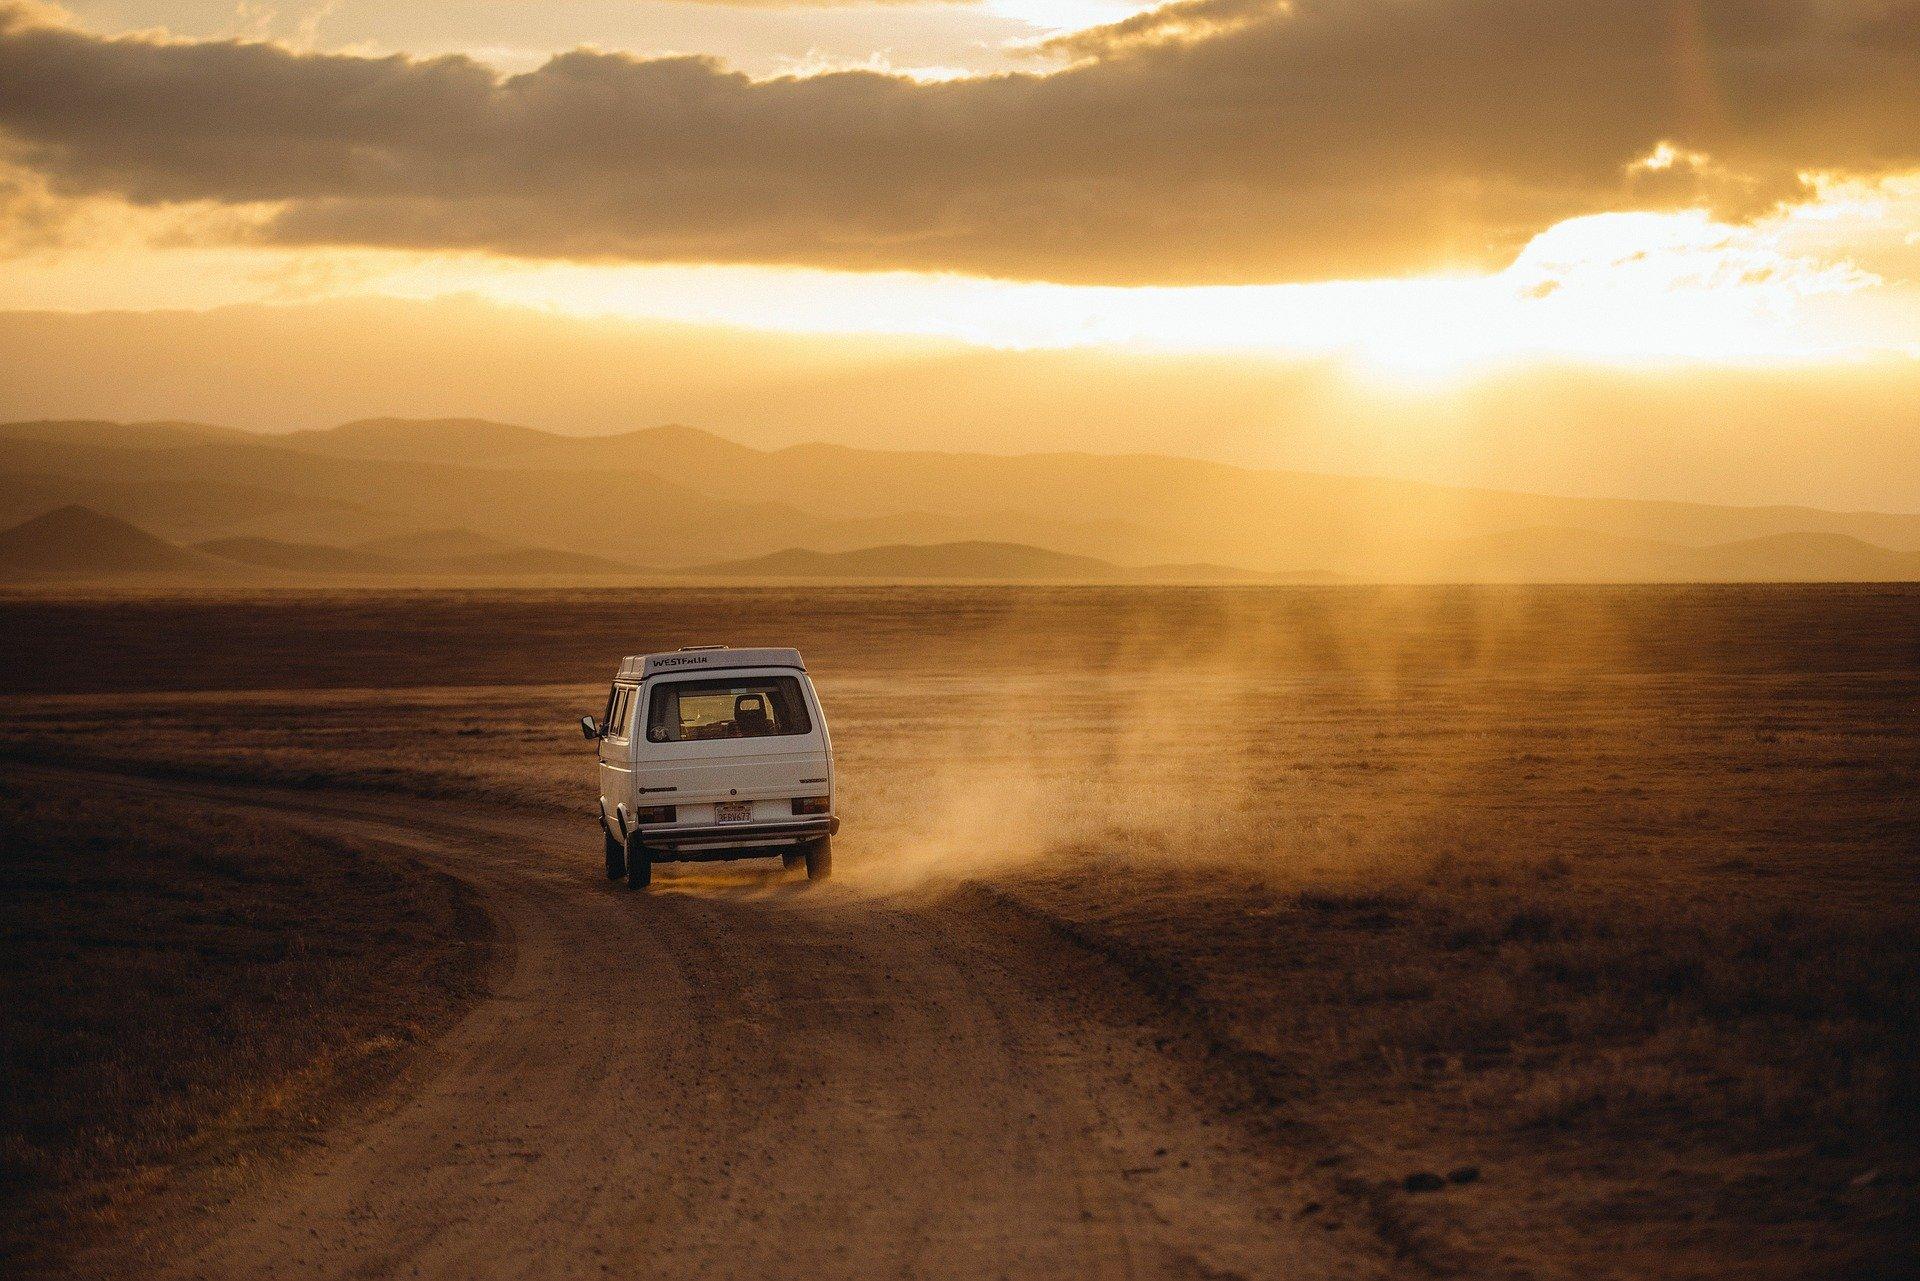 Road trip - Travel